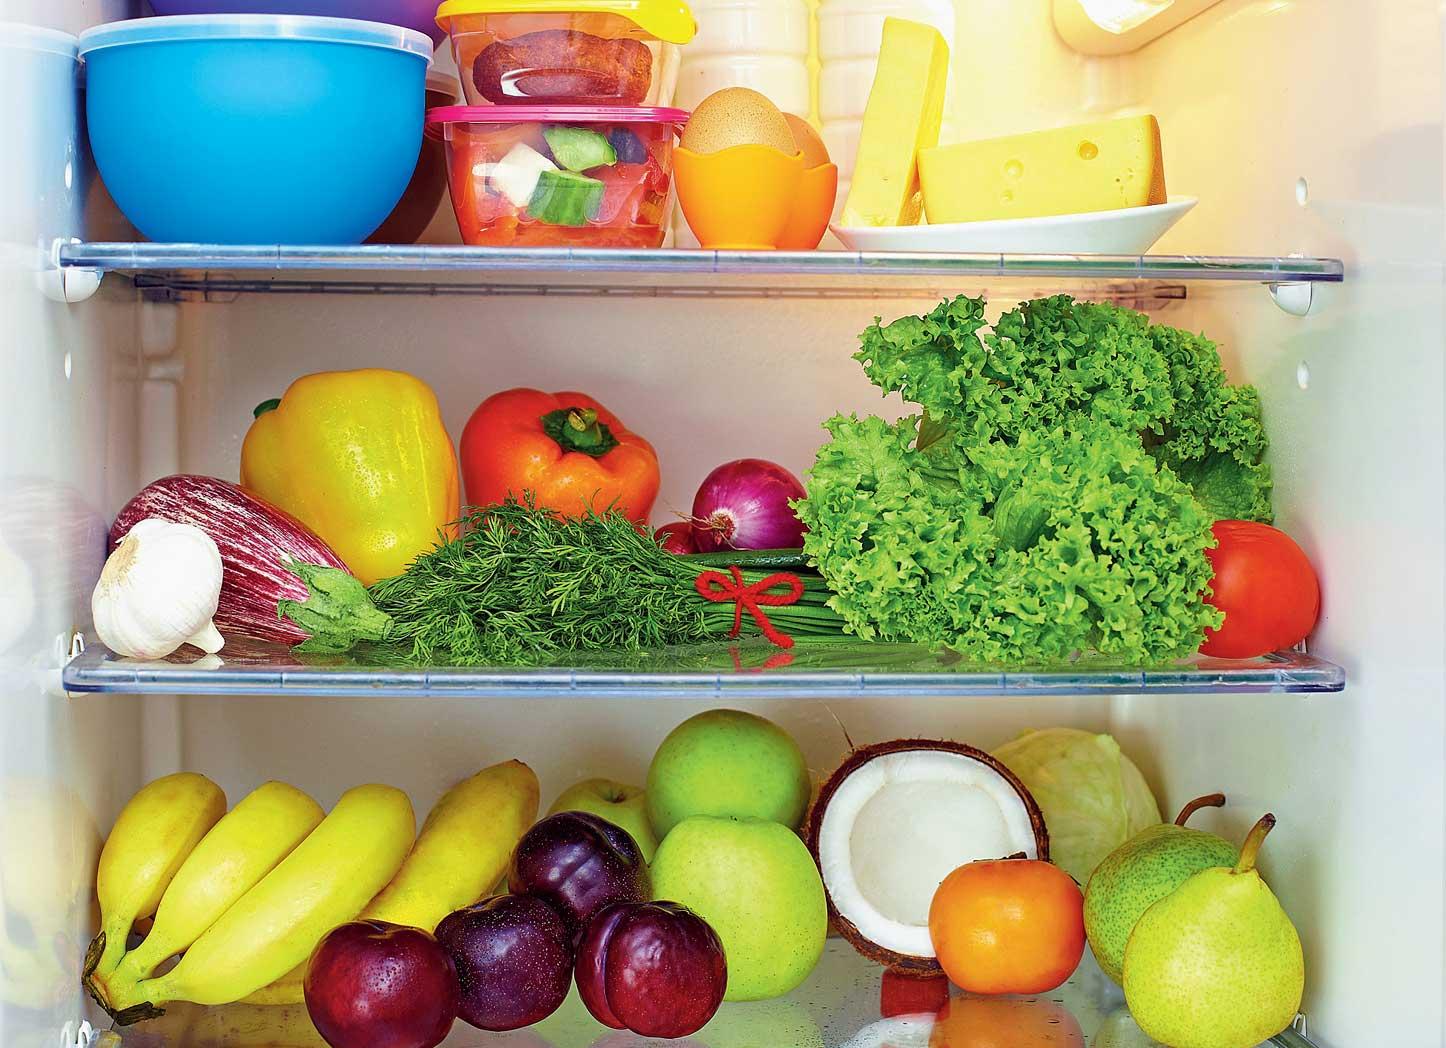 Frozen fruit and vegetables